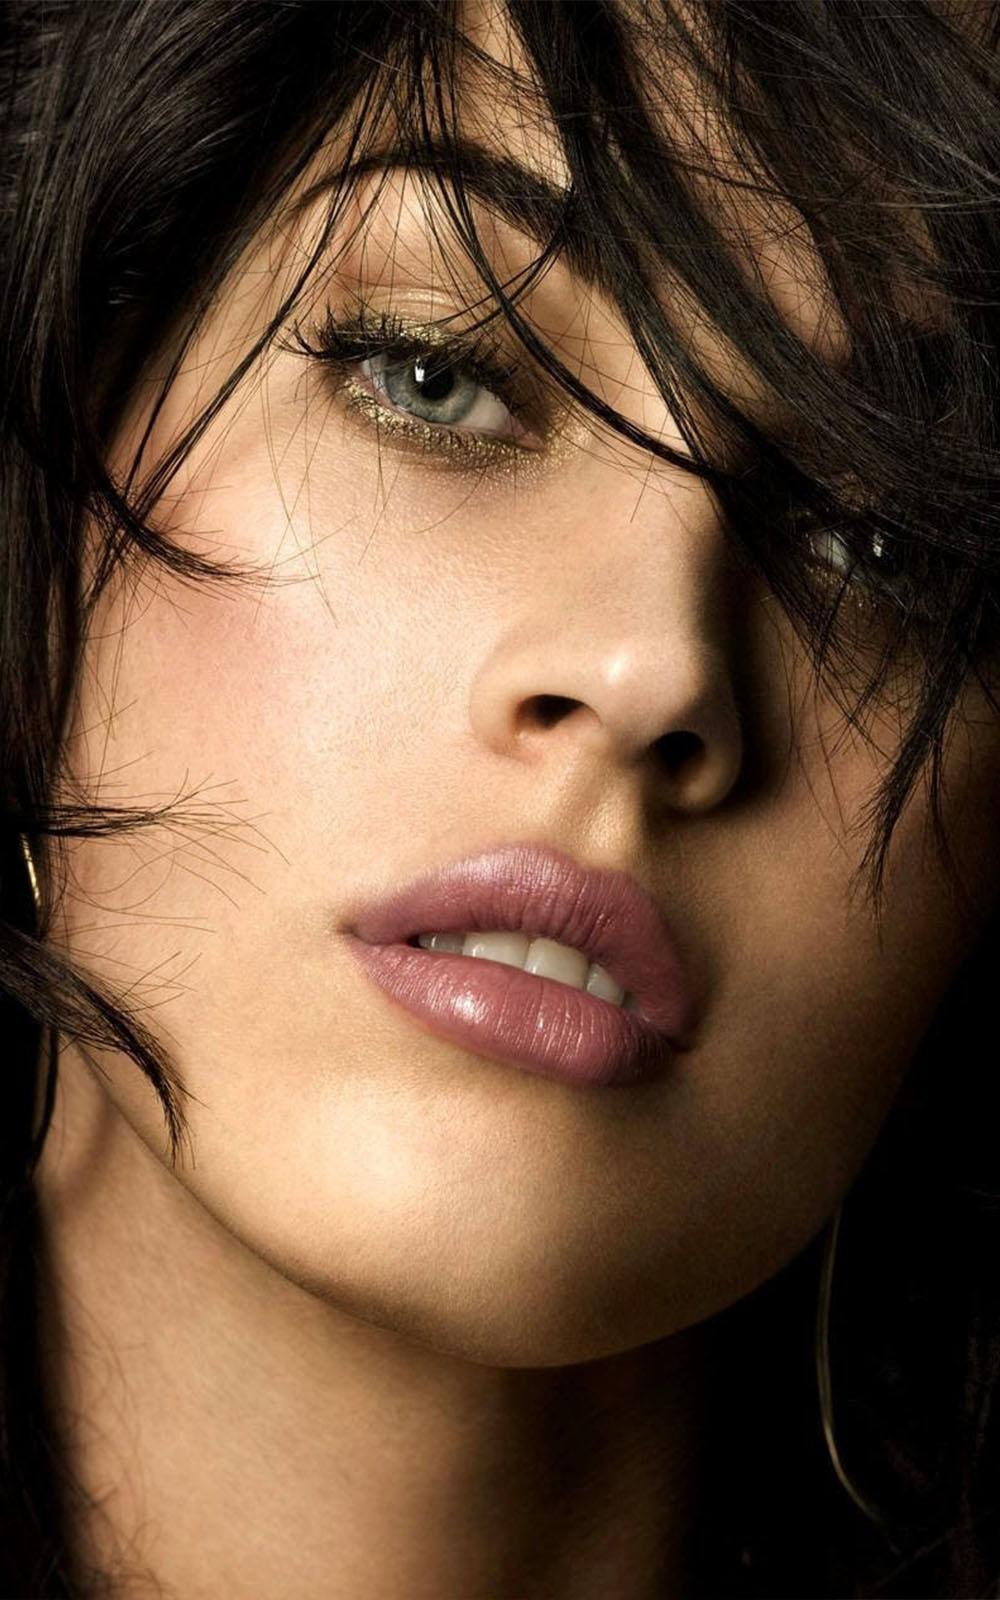 Megan Fox Close Photo Click Free 4K Ultra HD Mobile Wallpaper